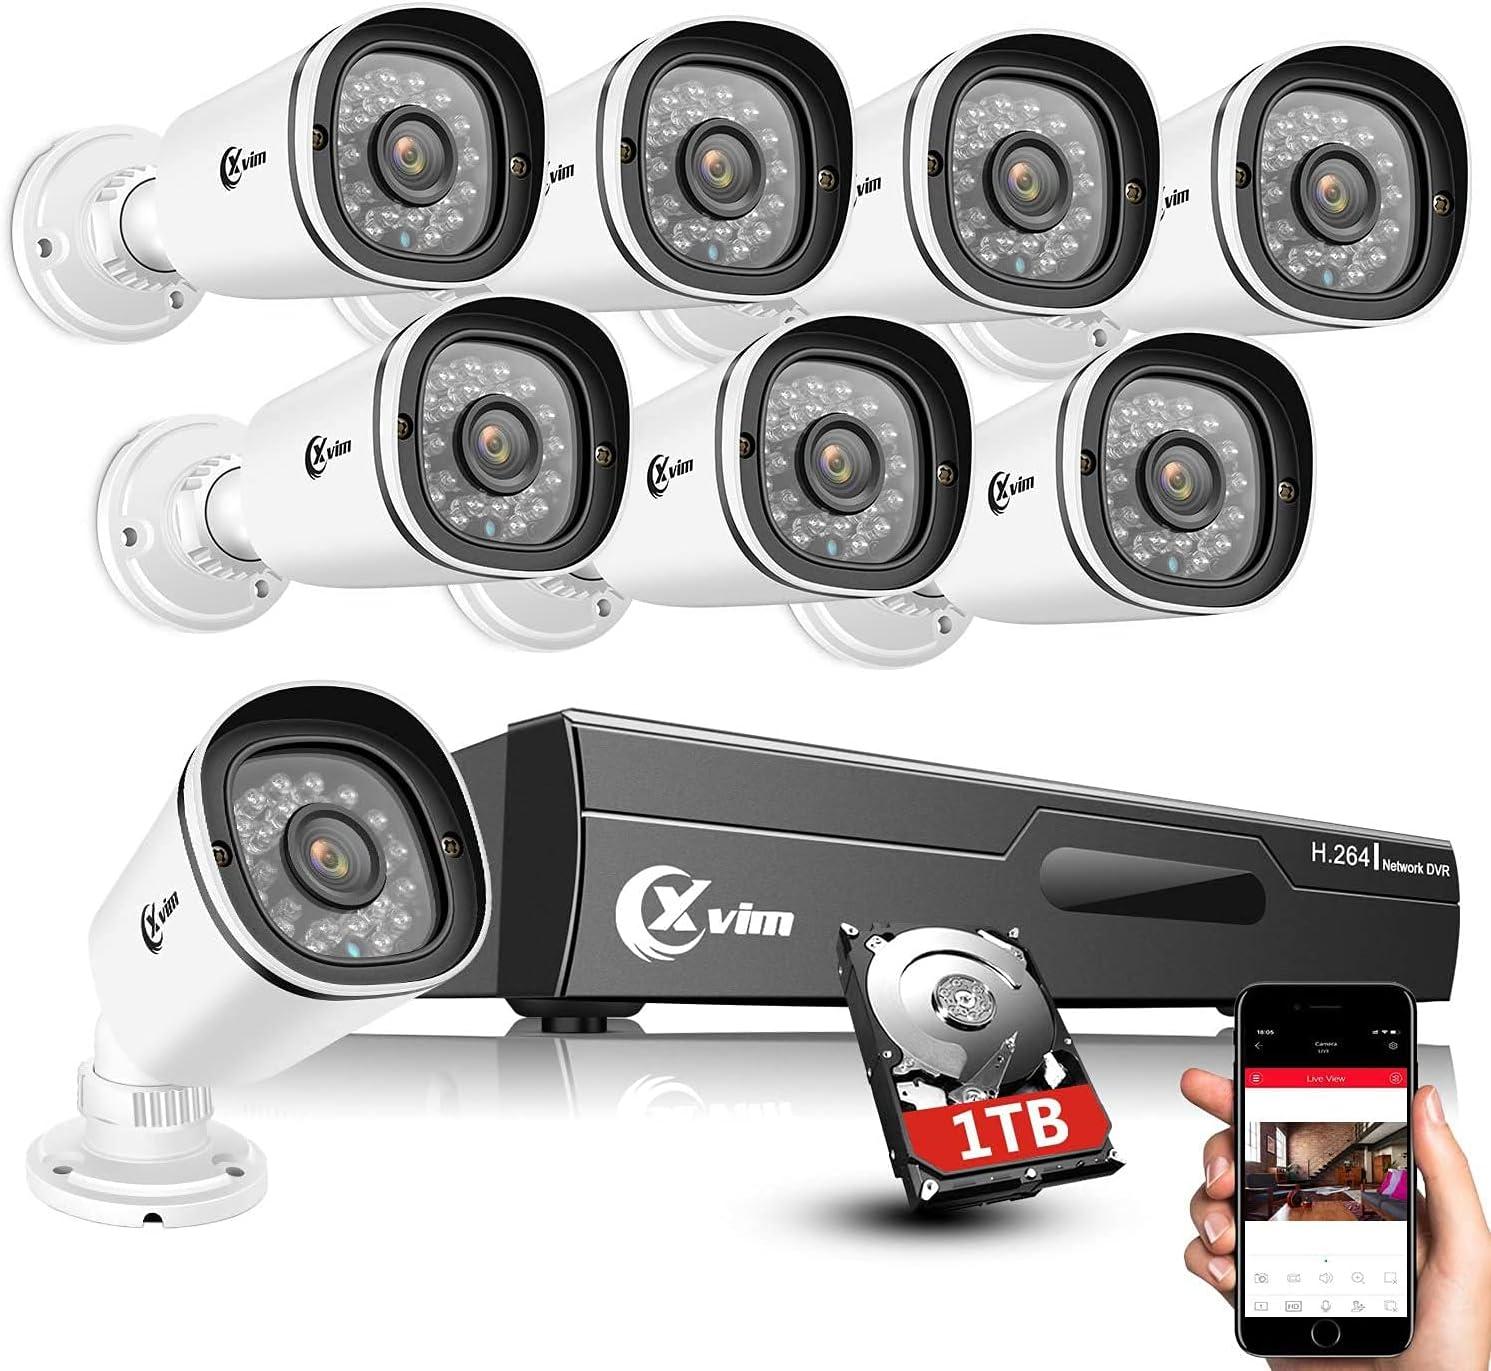 XVIM IP66 Home Security Camera System